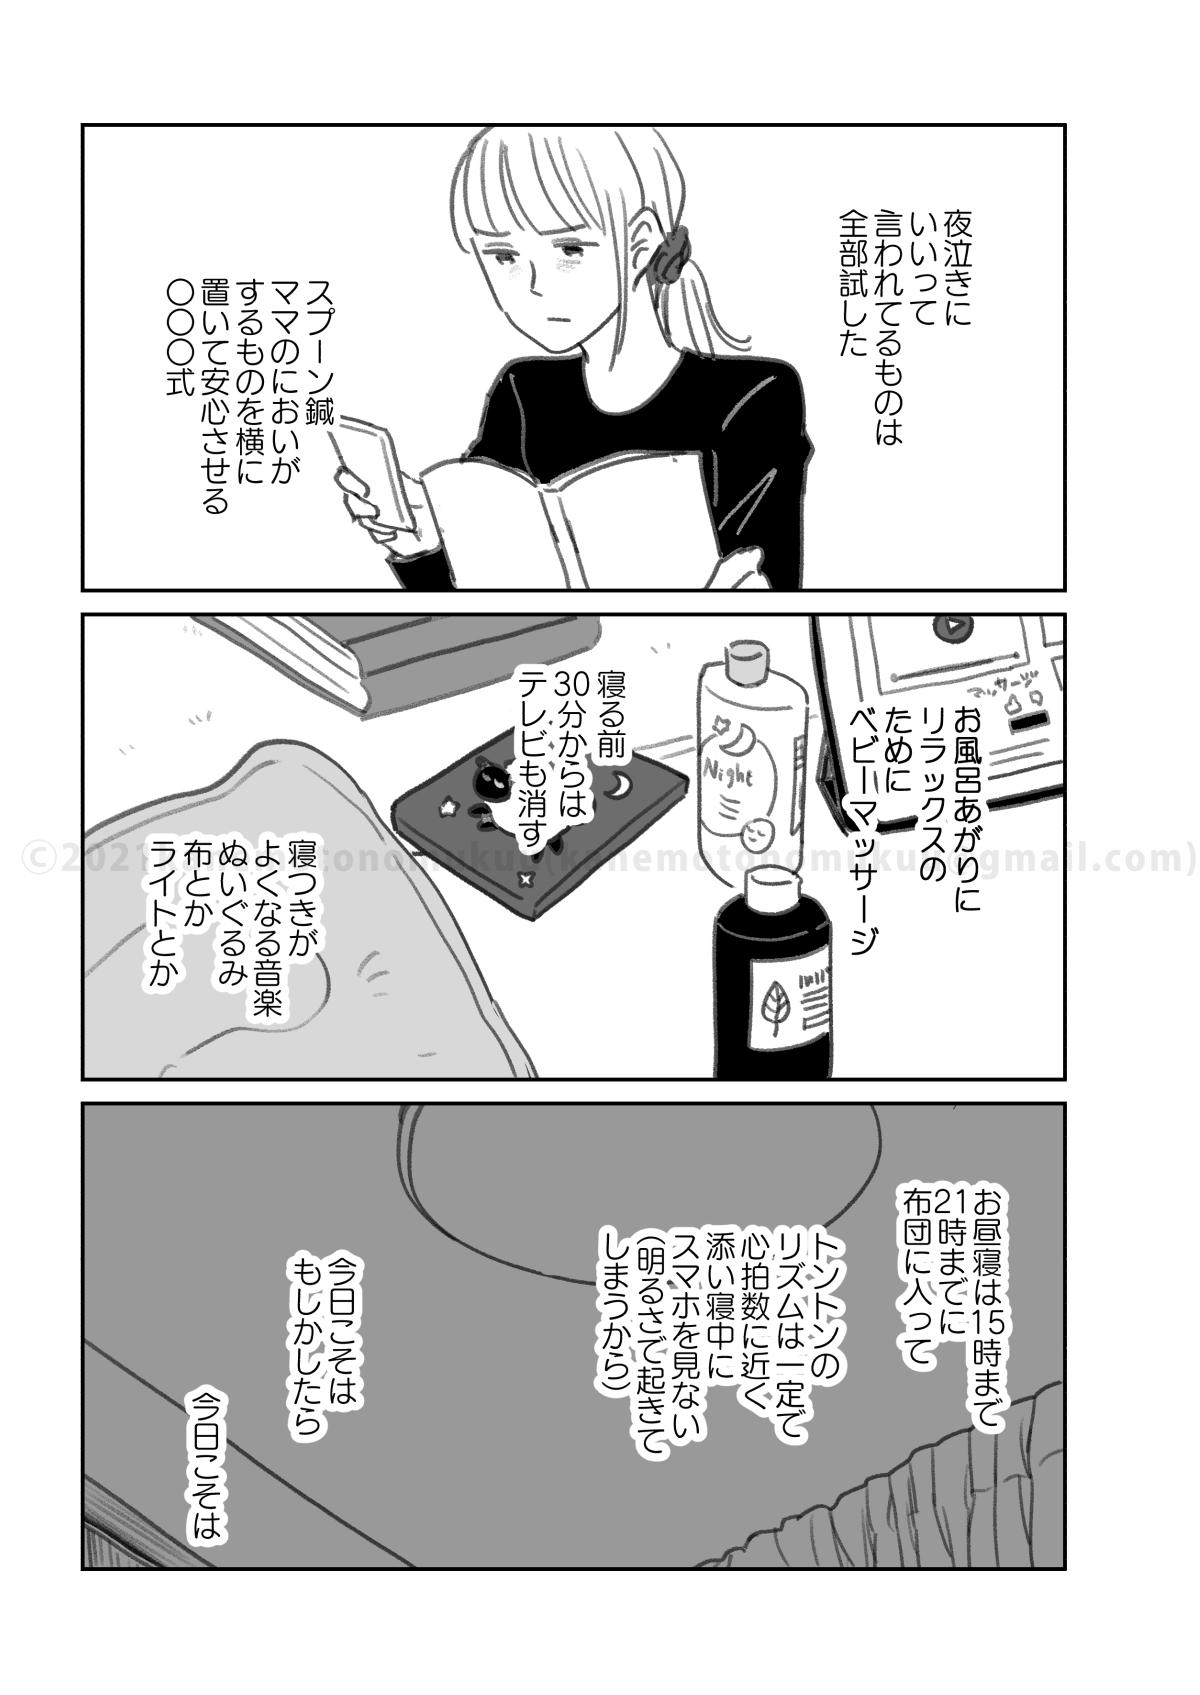 f:id:kanemotonomukuu:20210319174952j:plain